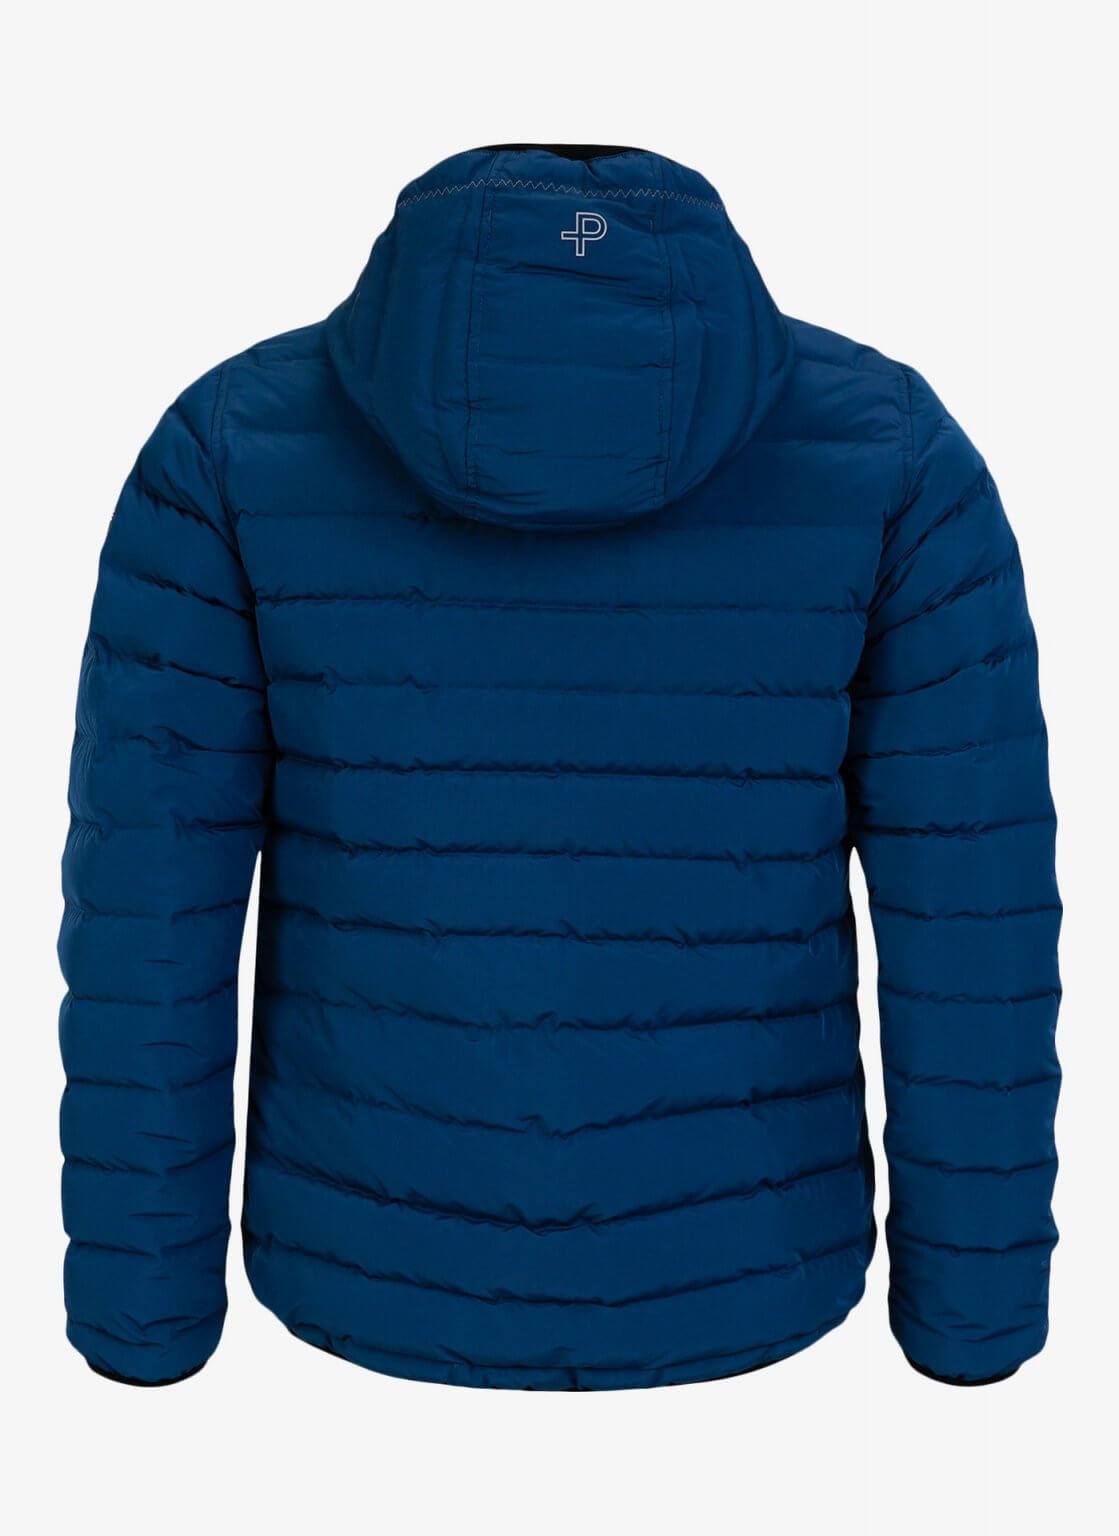 Pelle Urbis Jacket